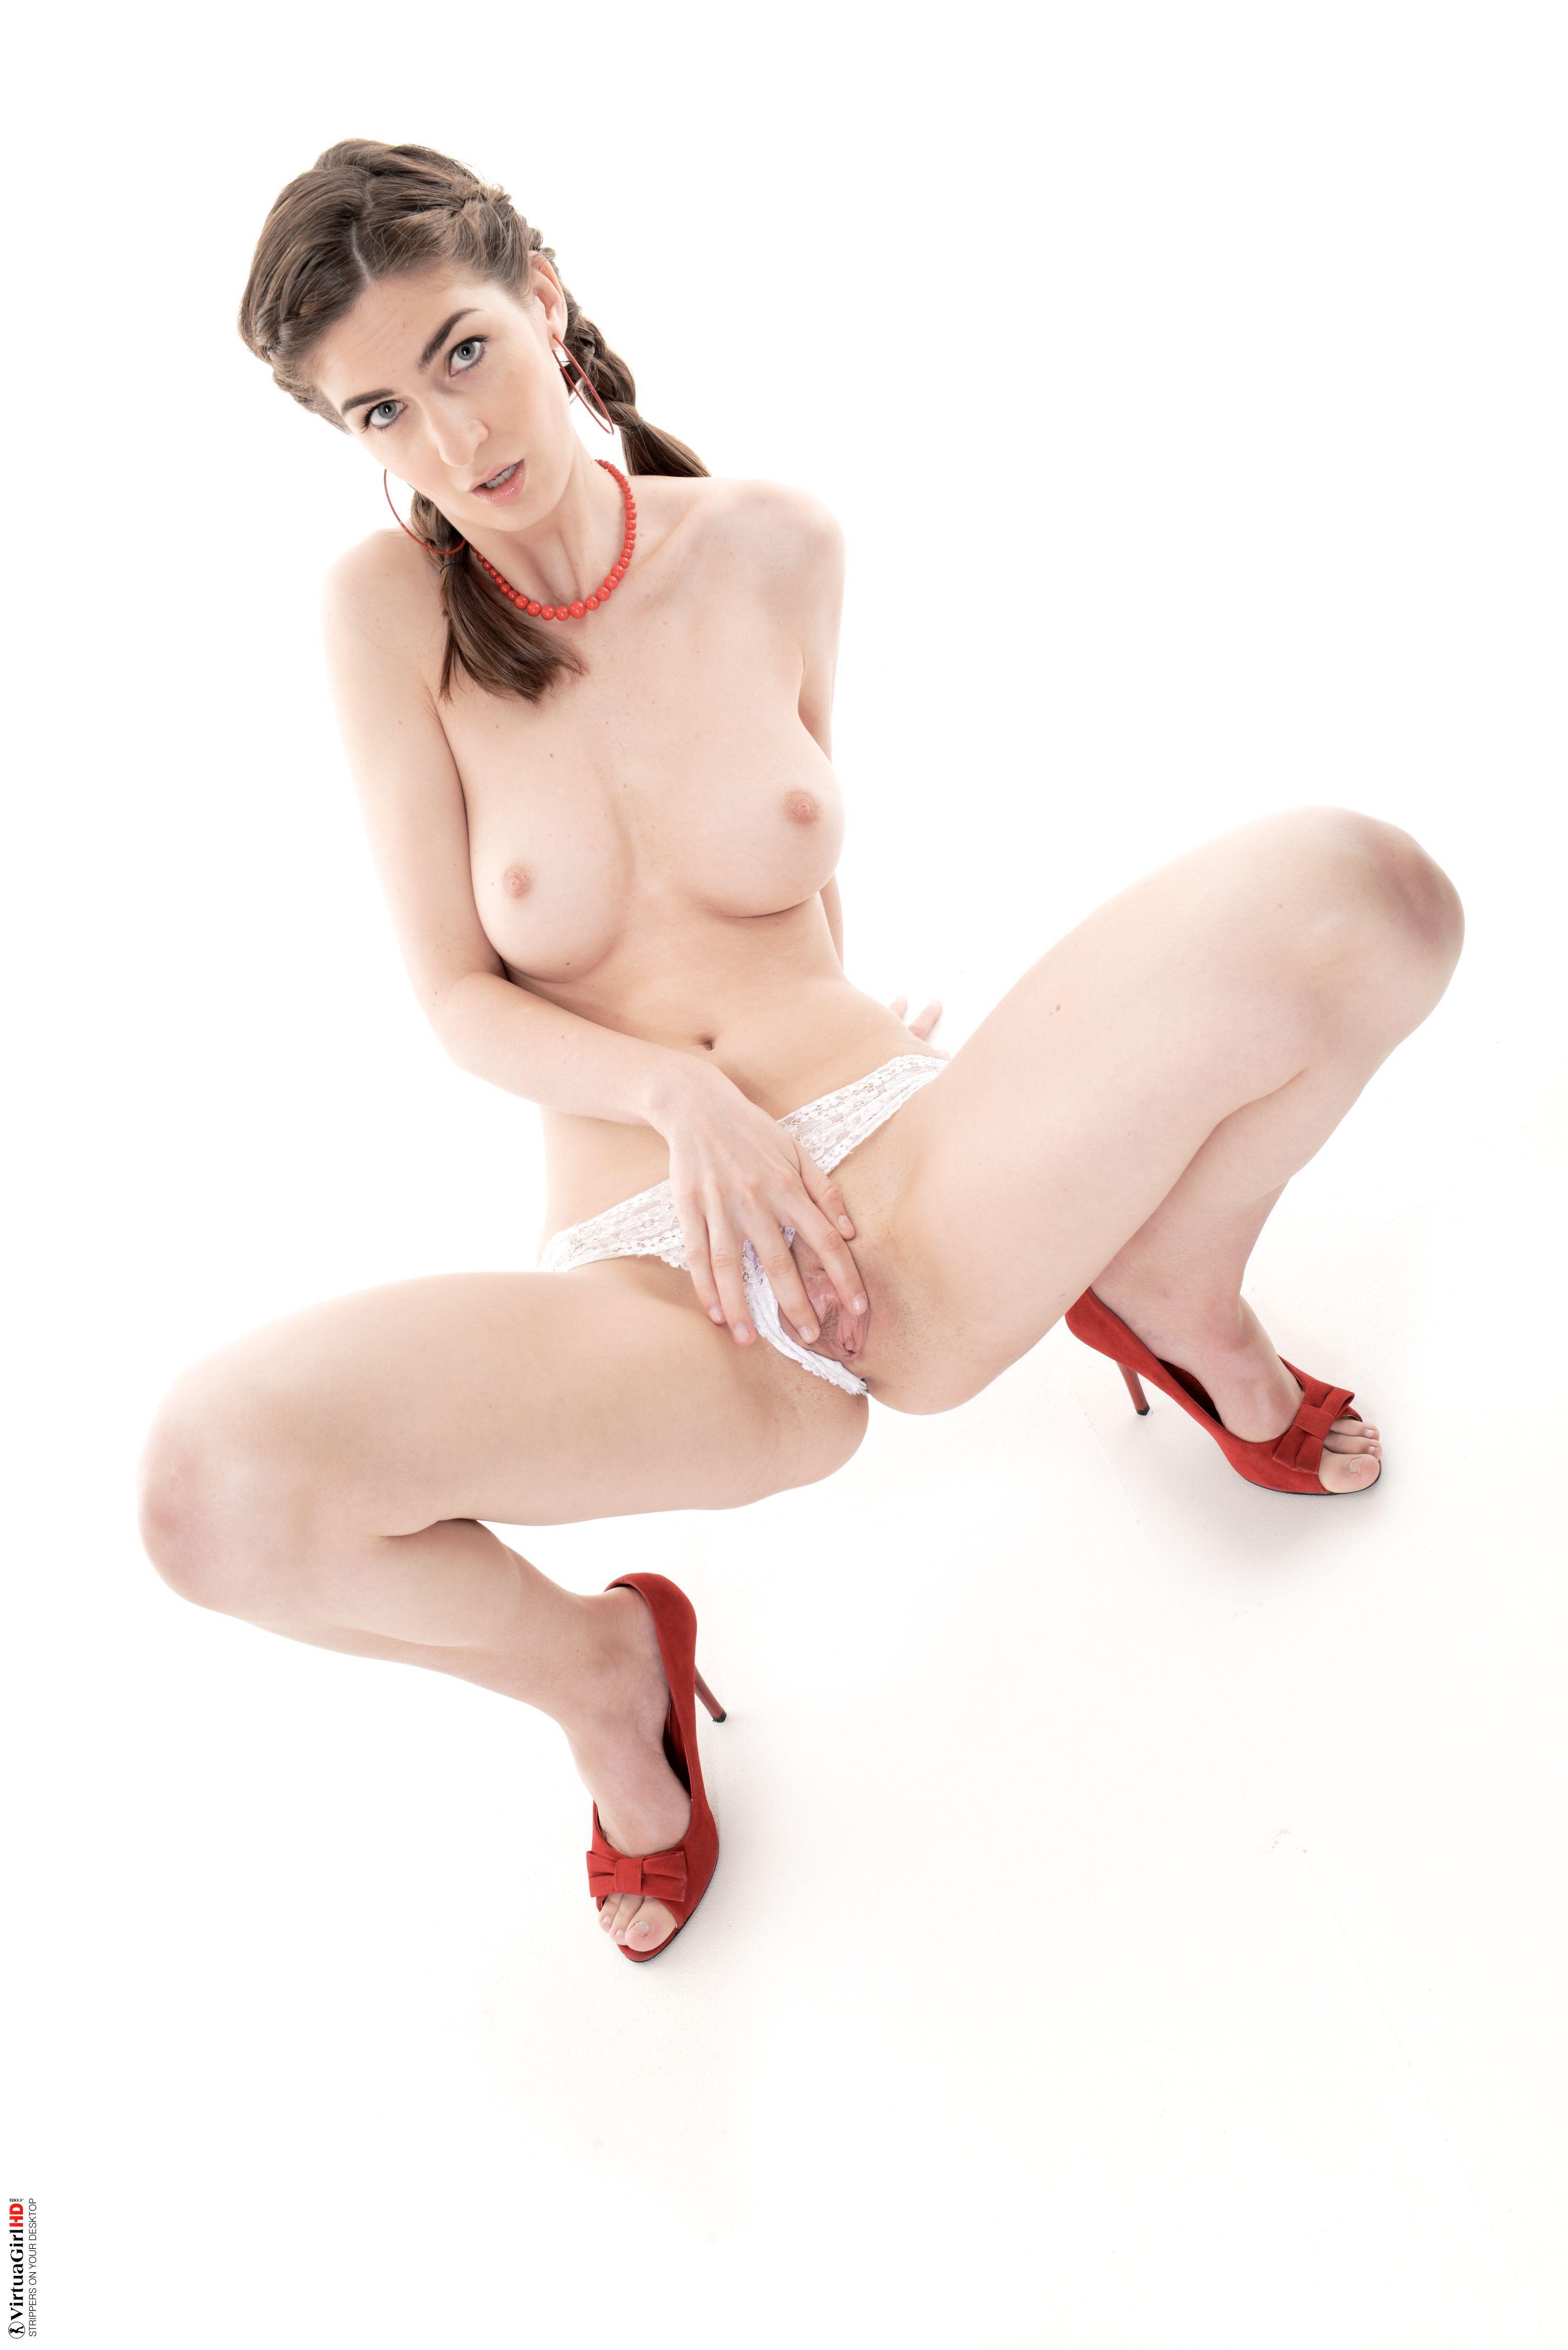 nude sexy wallpaper hd